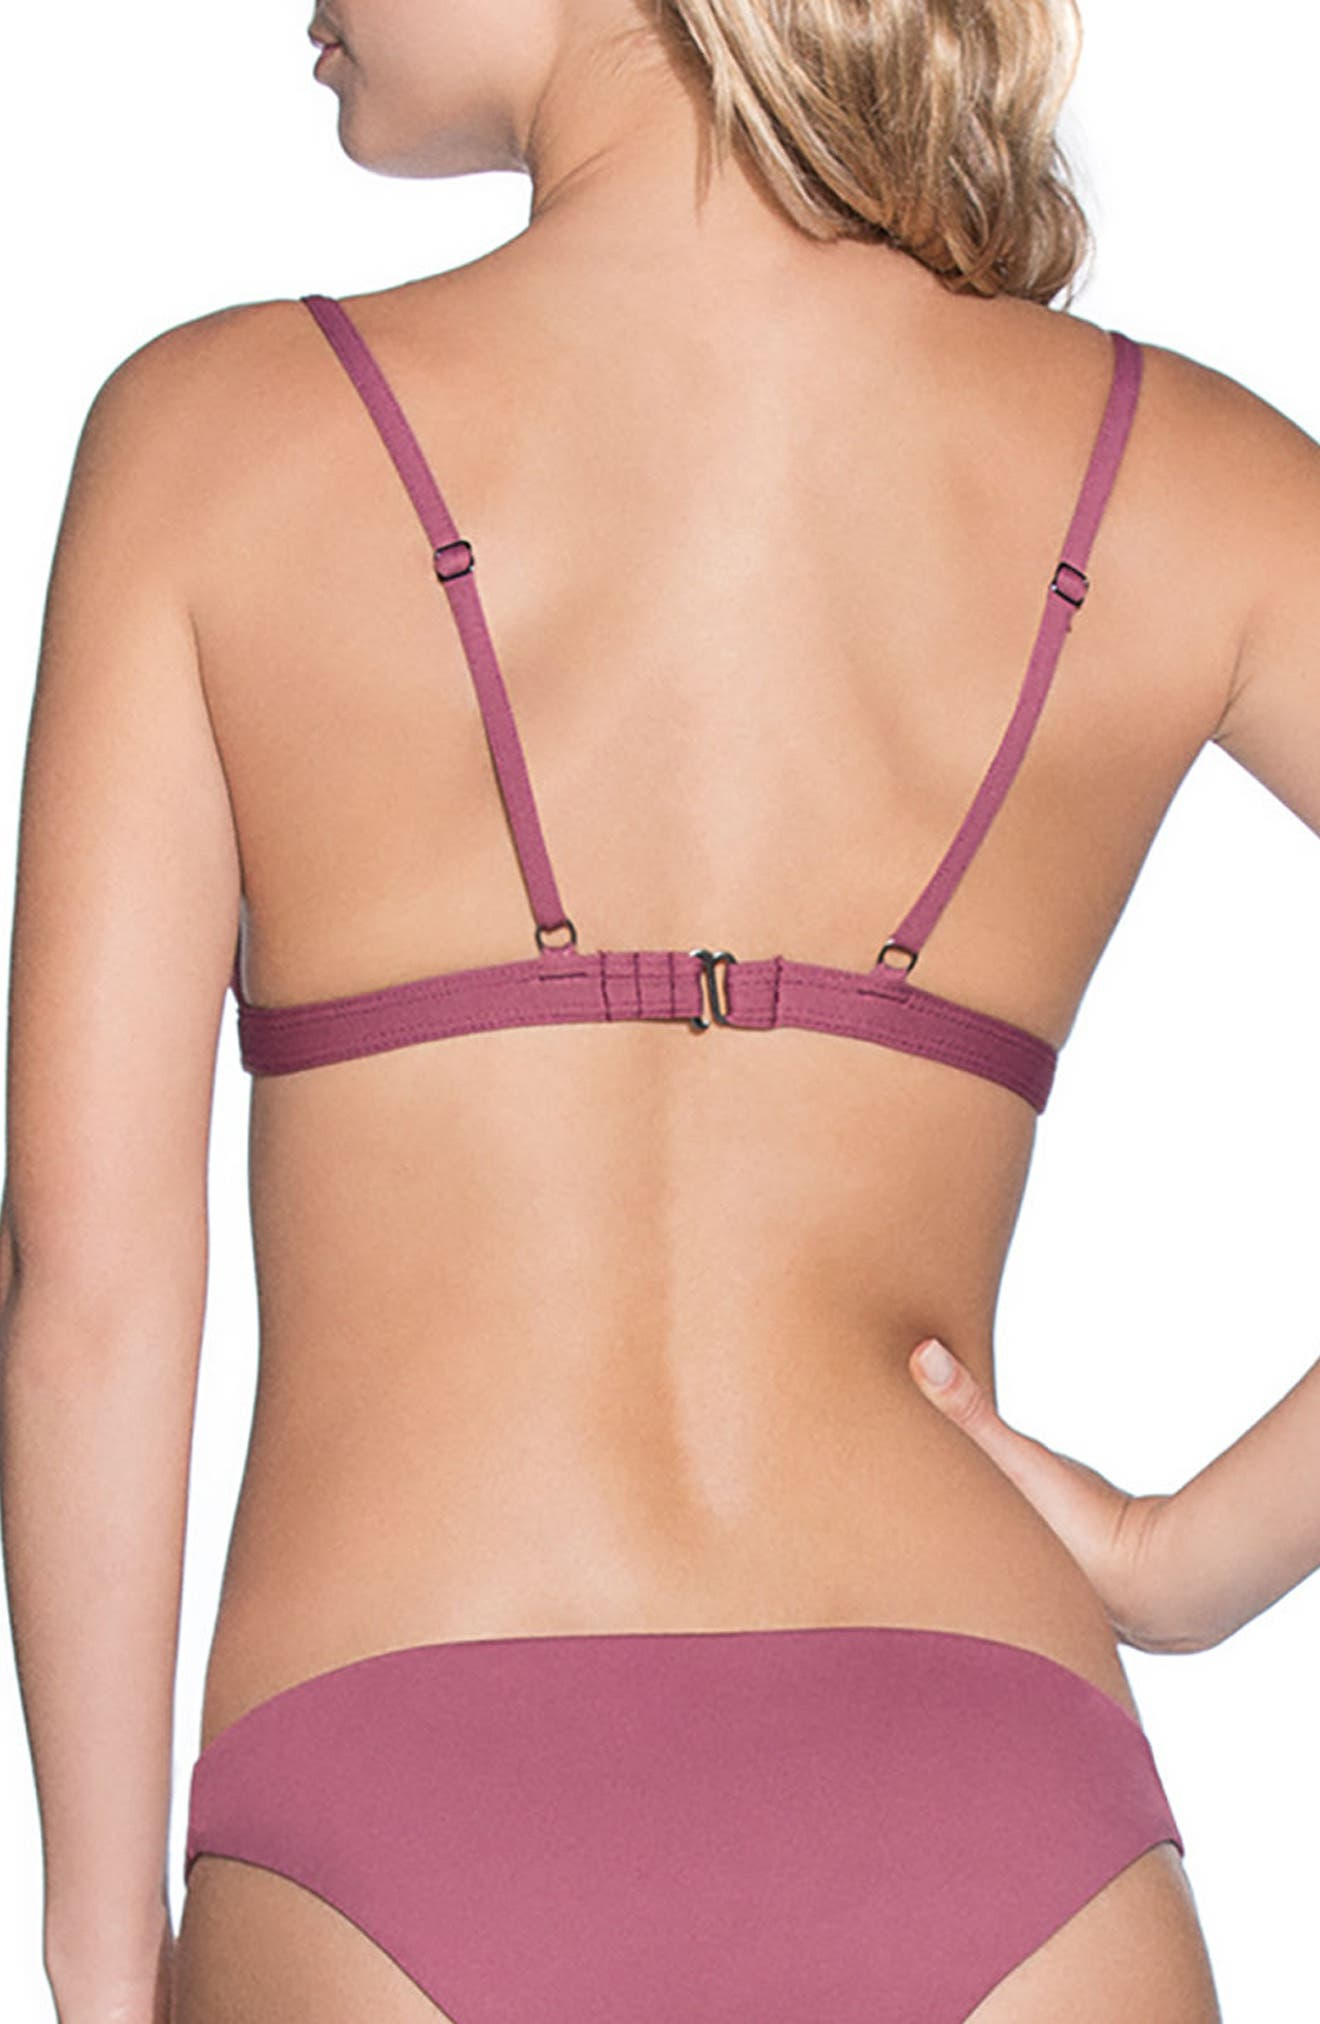 Juneberry Delightful Reversible Bikini Top,                             Alternate thumbnail 3, color,                             650